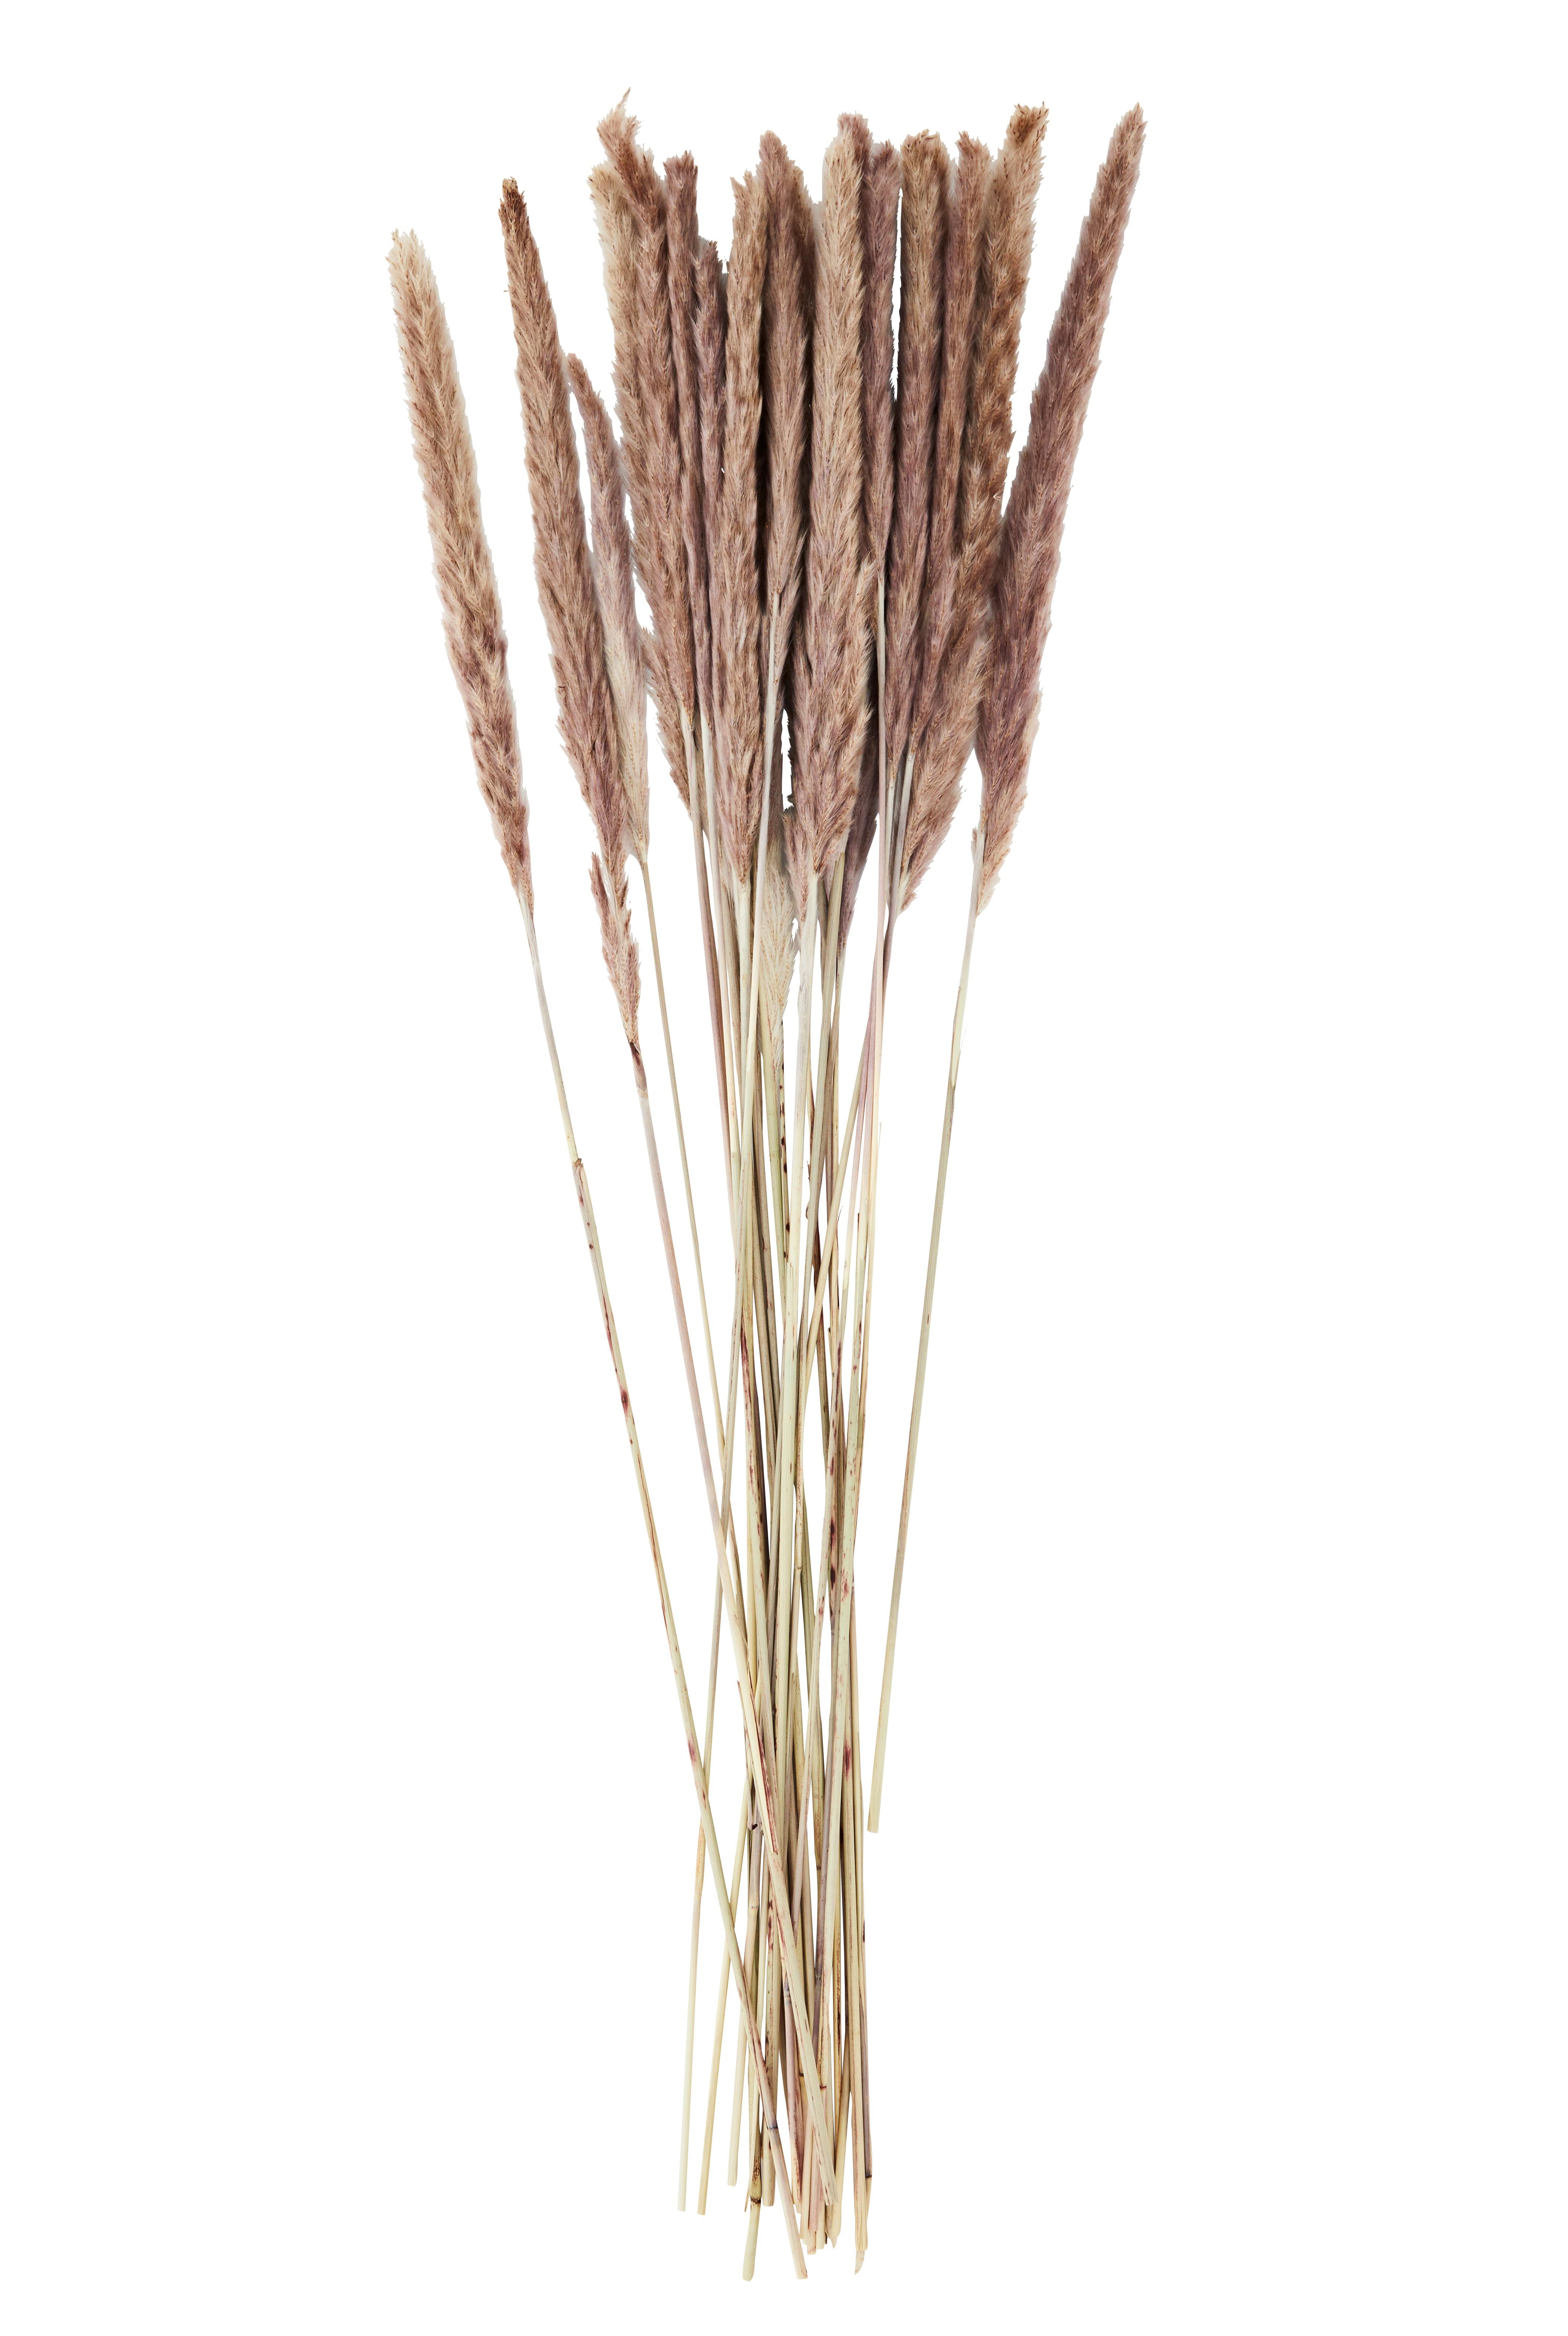 Chinaschilf / miscanthus floridulus